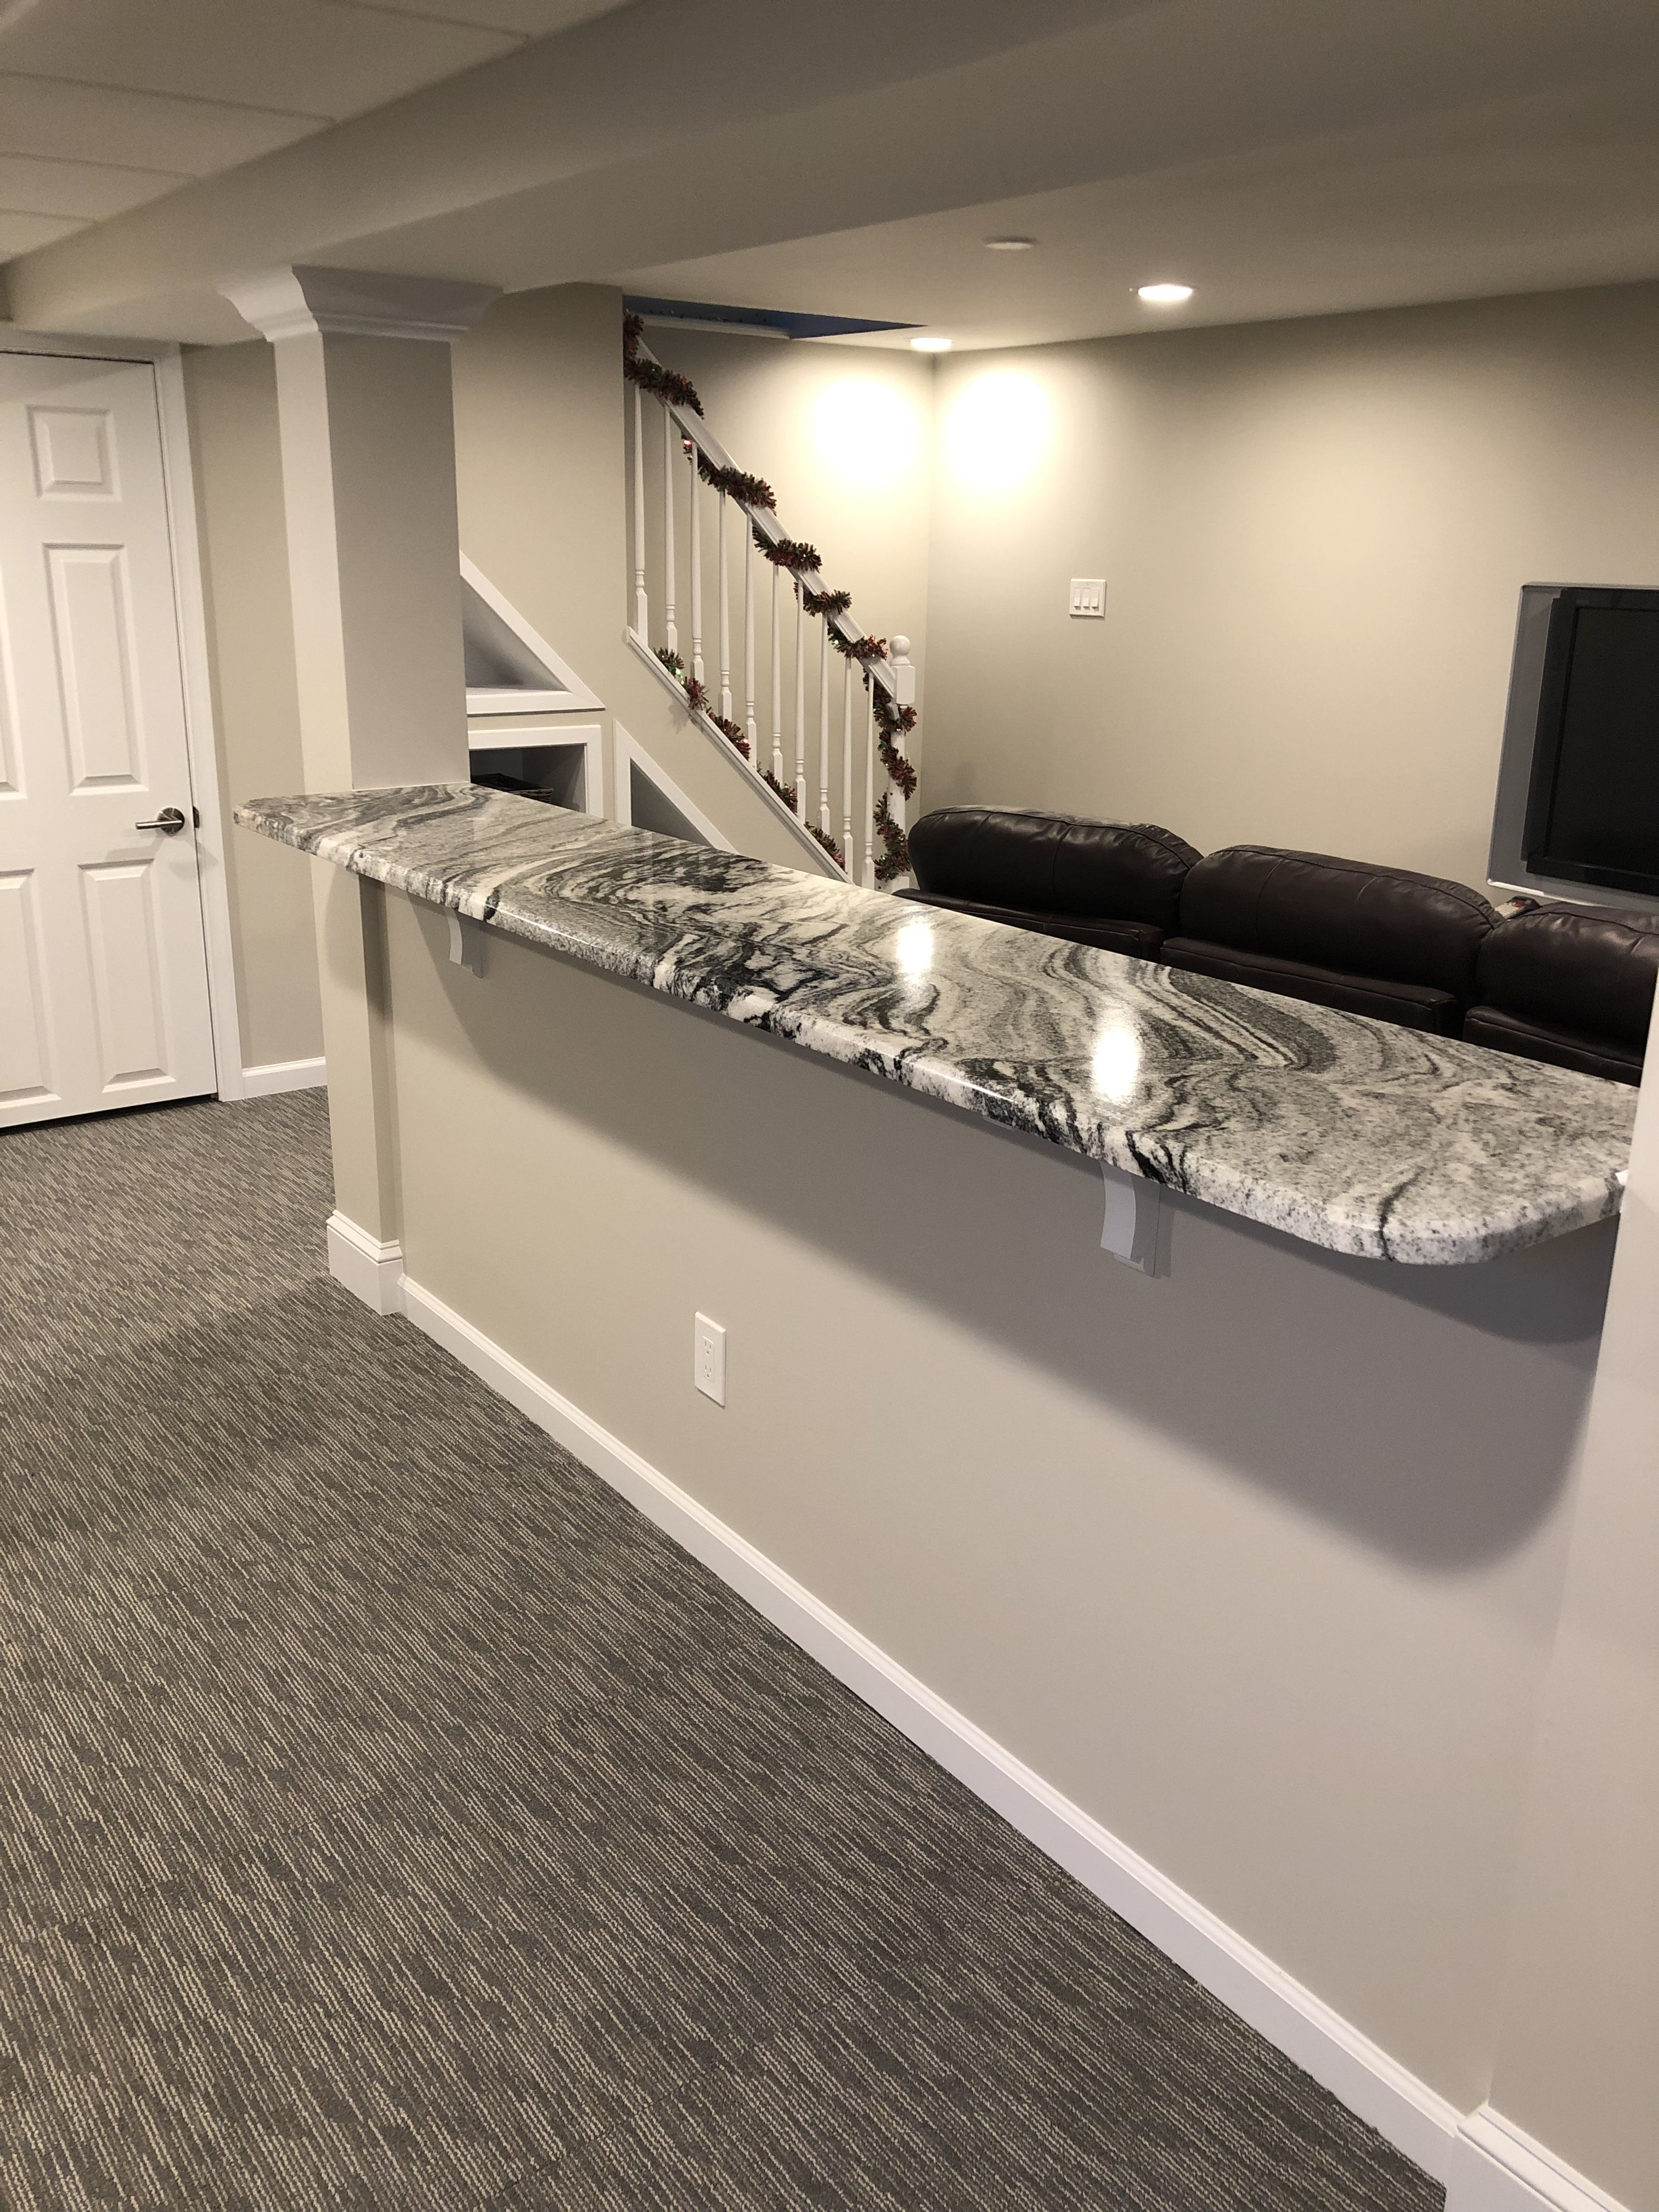 Half Wall Bar With Images Basement Makeover Half Wall Room